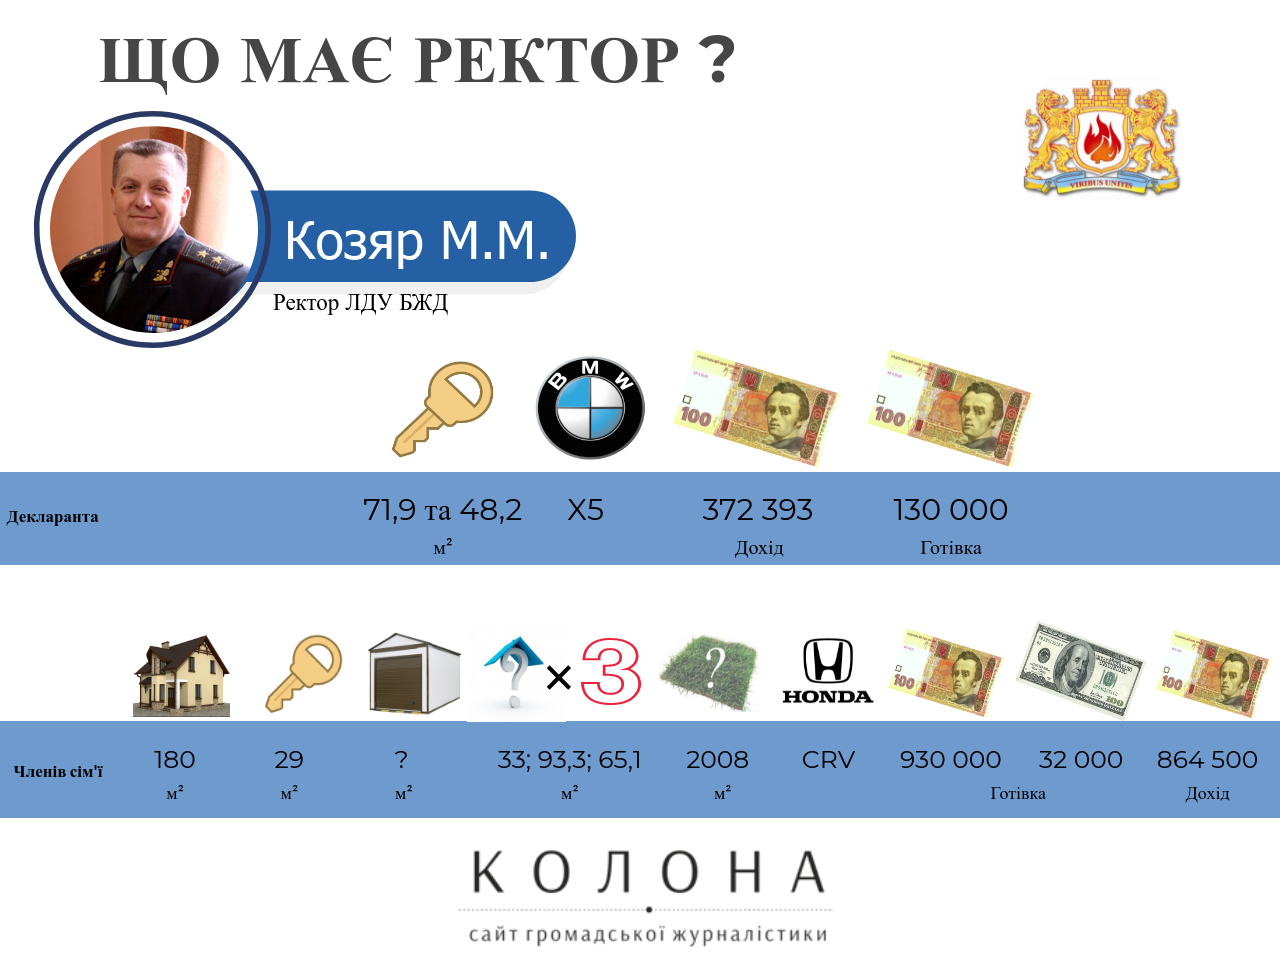 Козяр Михайло Миколайович